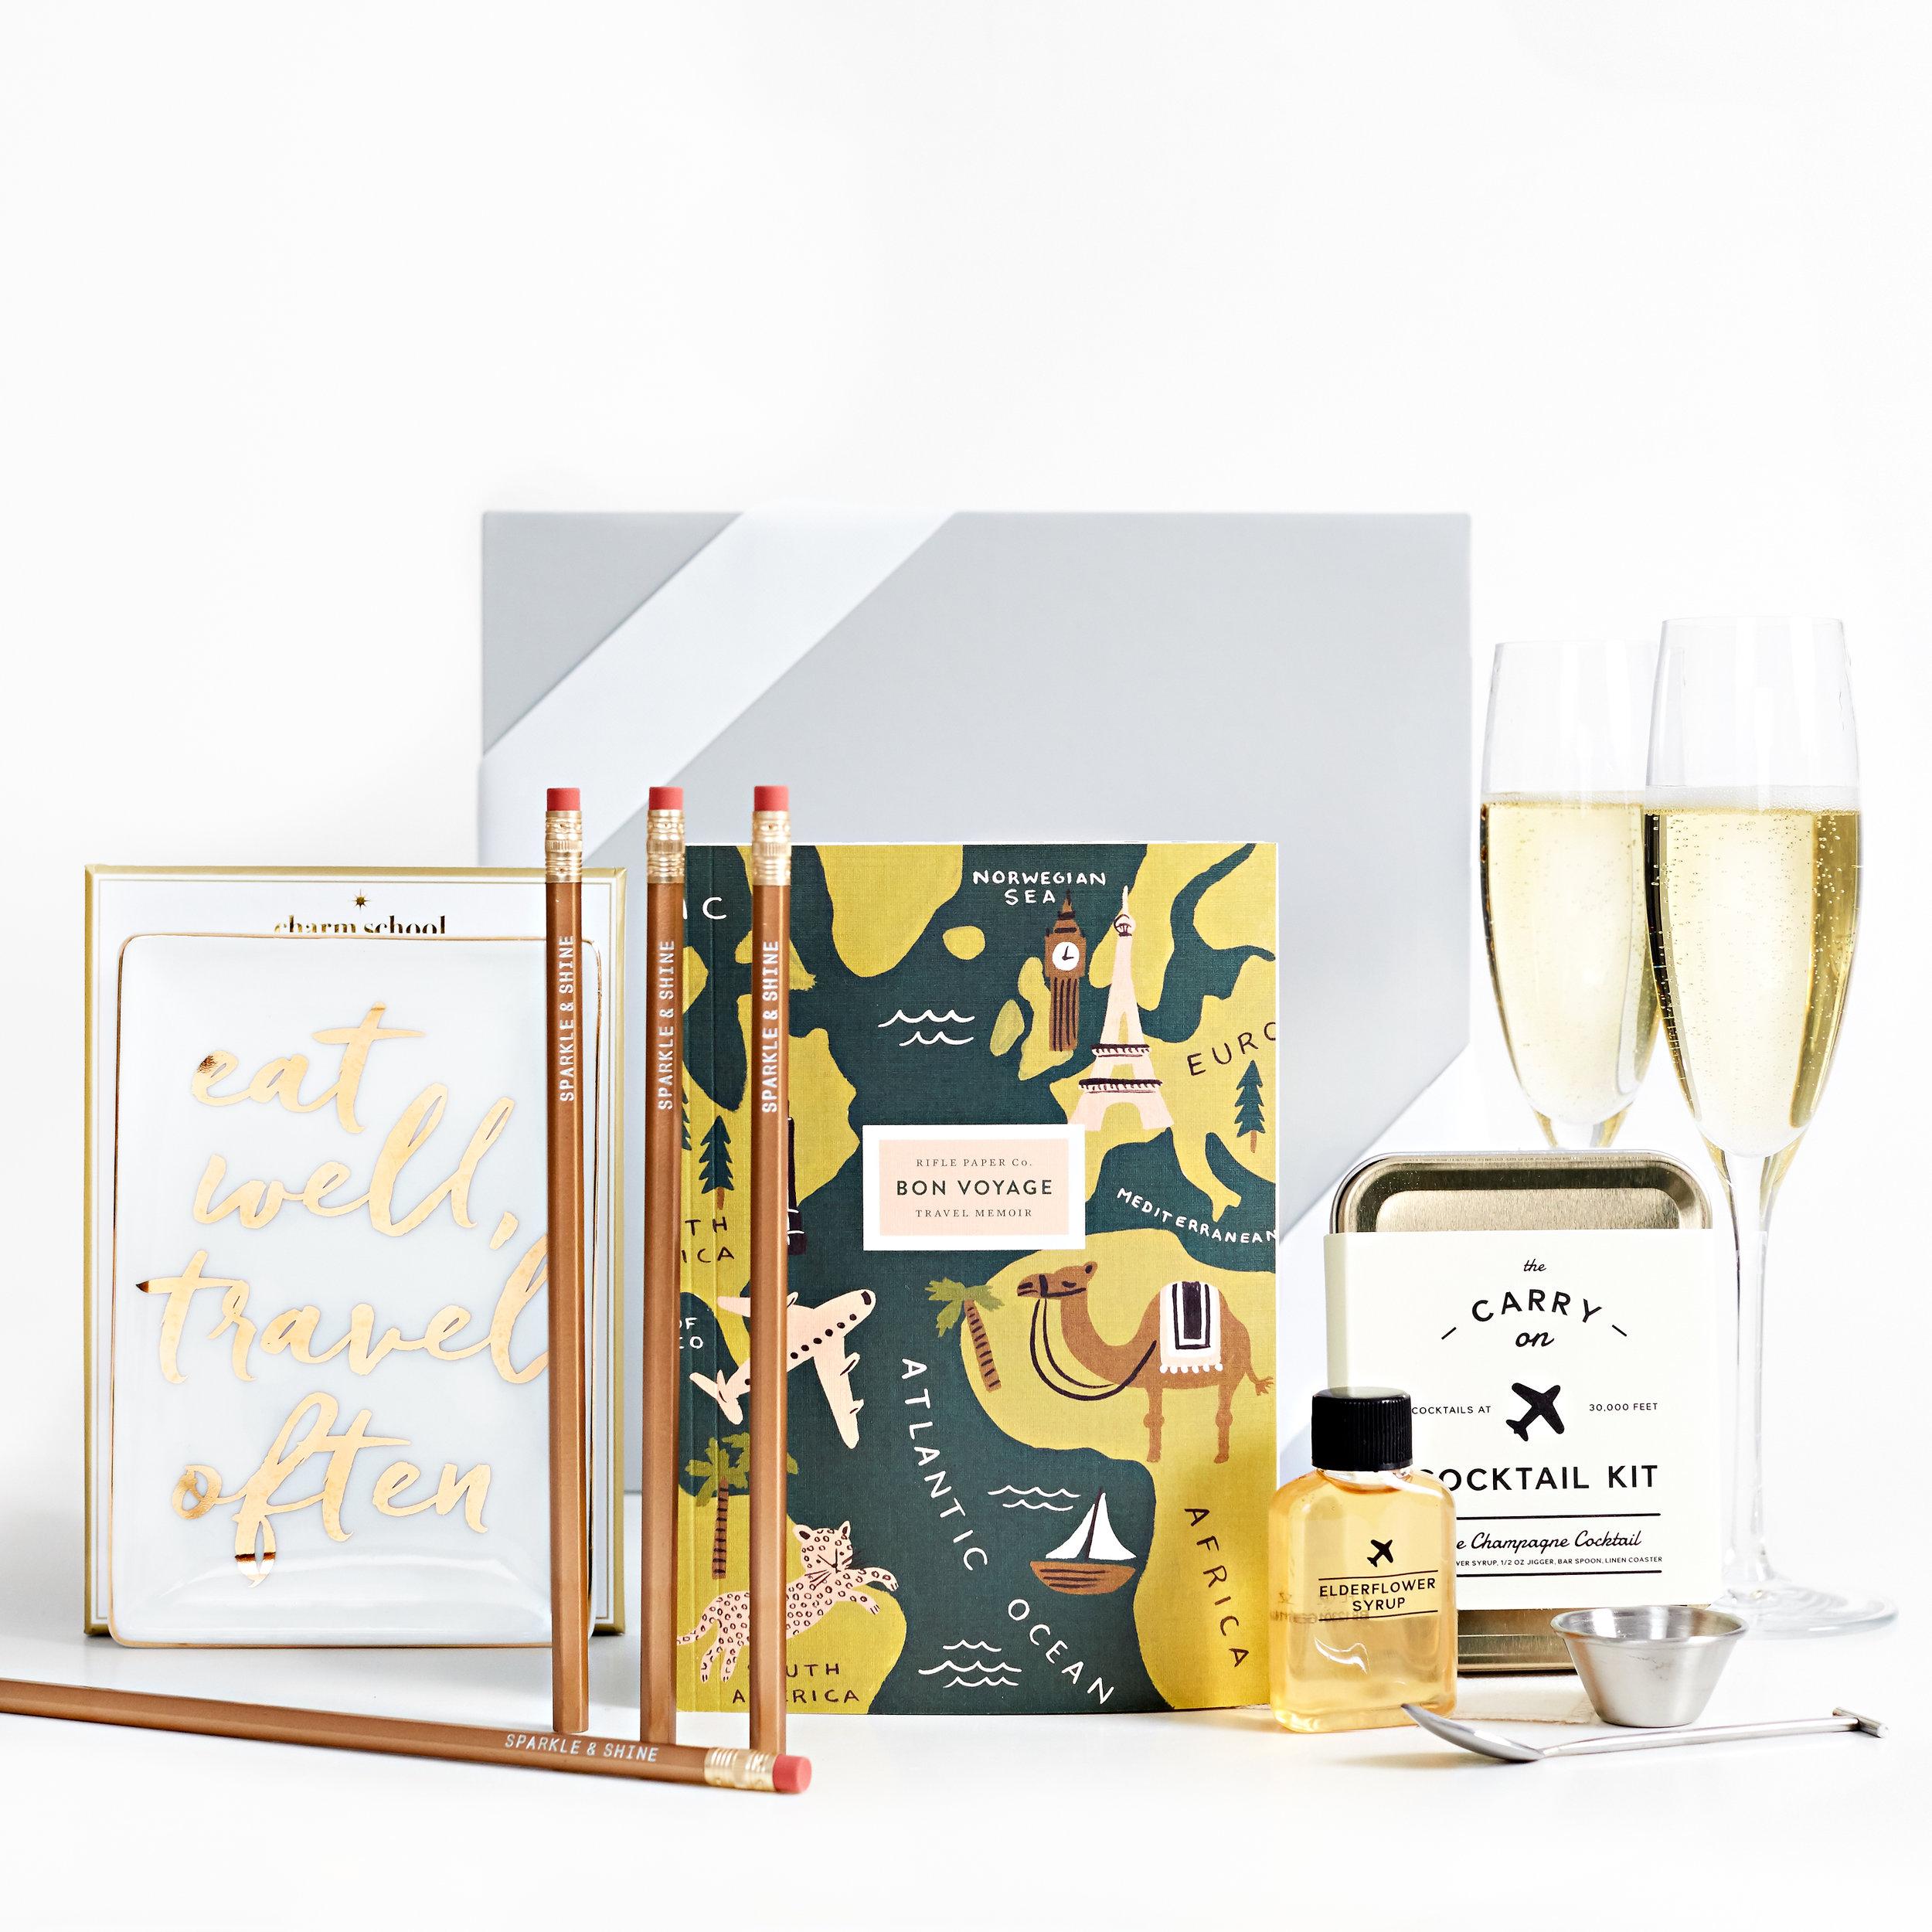 Champagne Cocktail Kit2.jpg